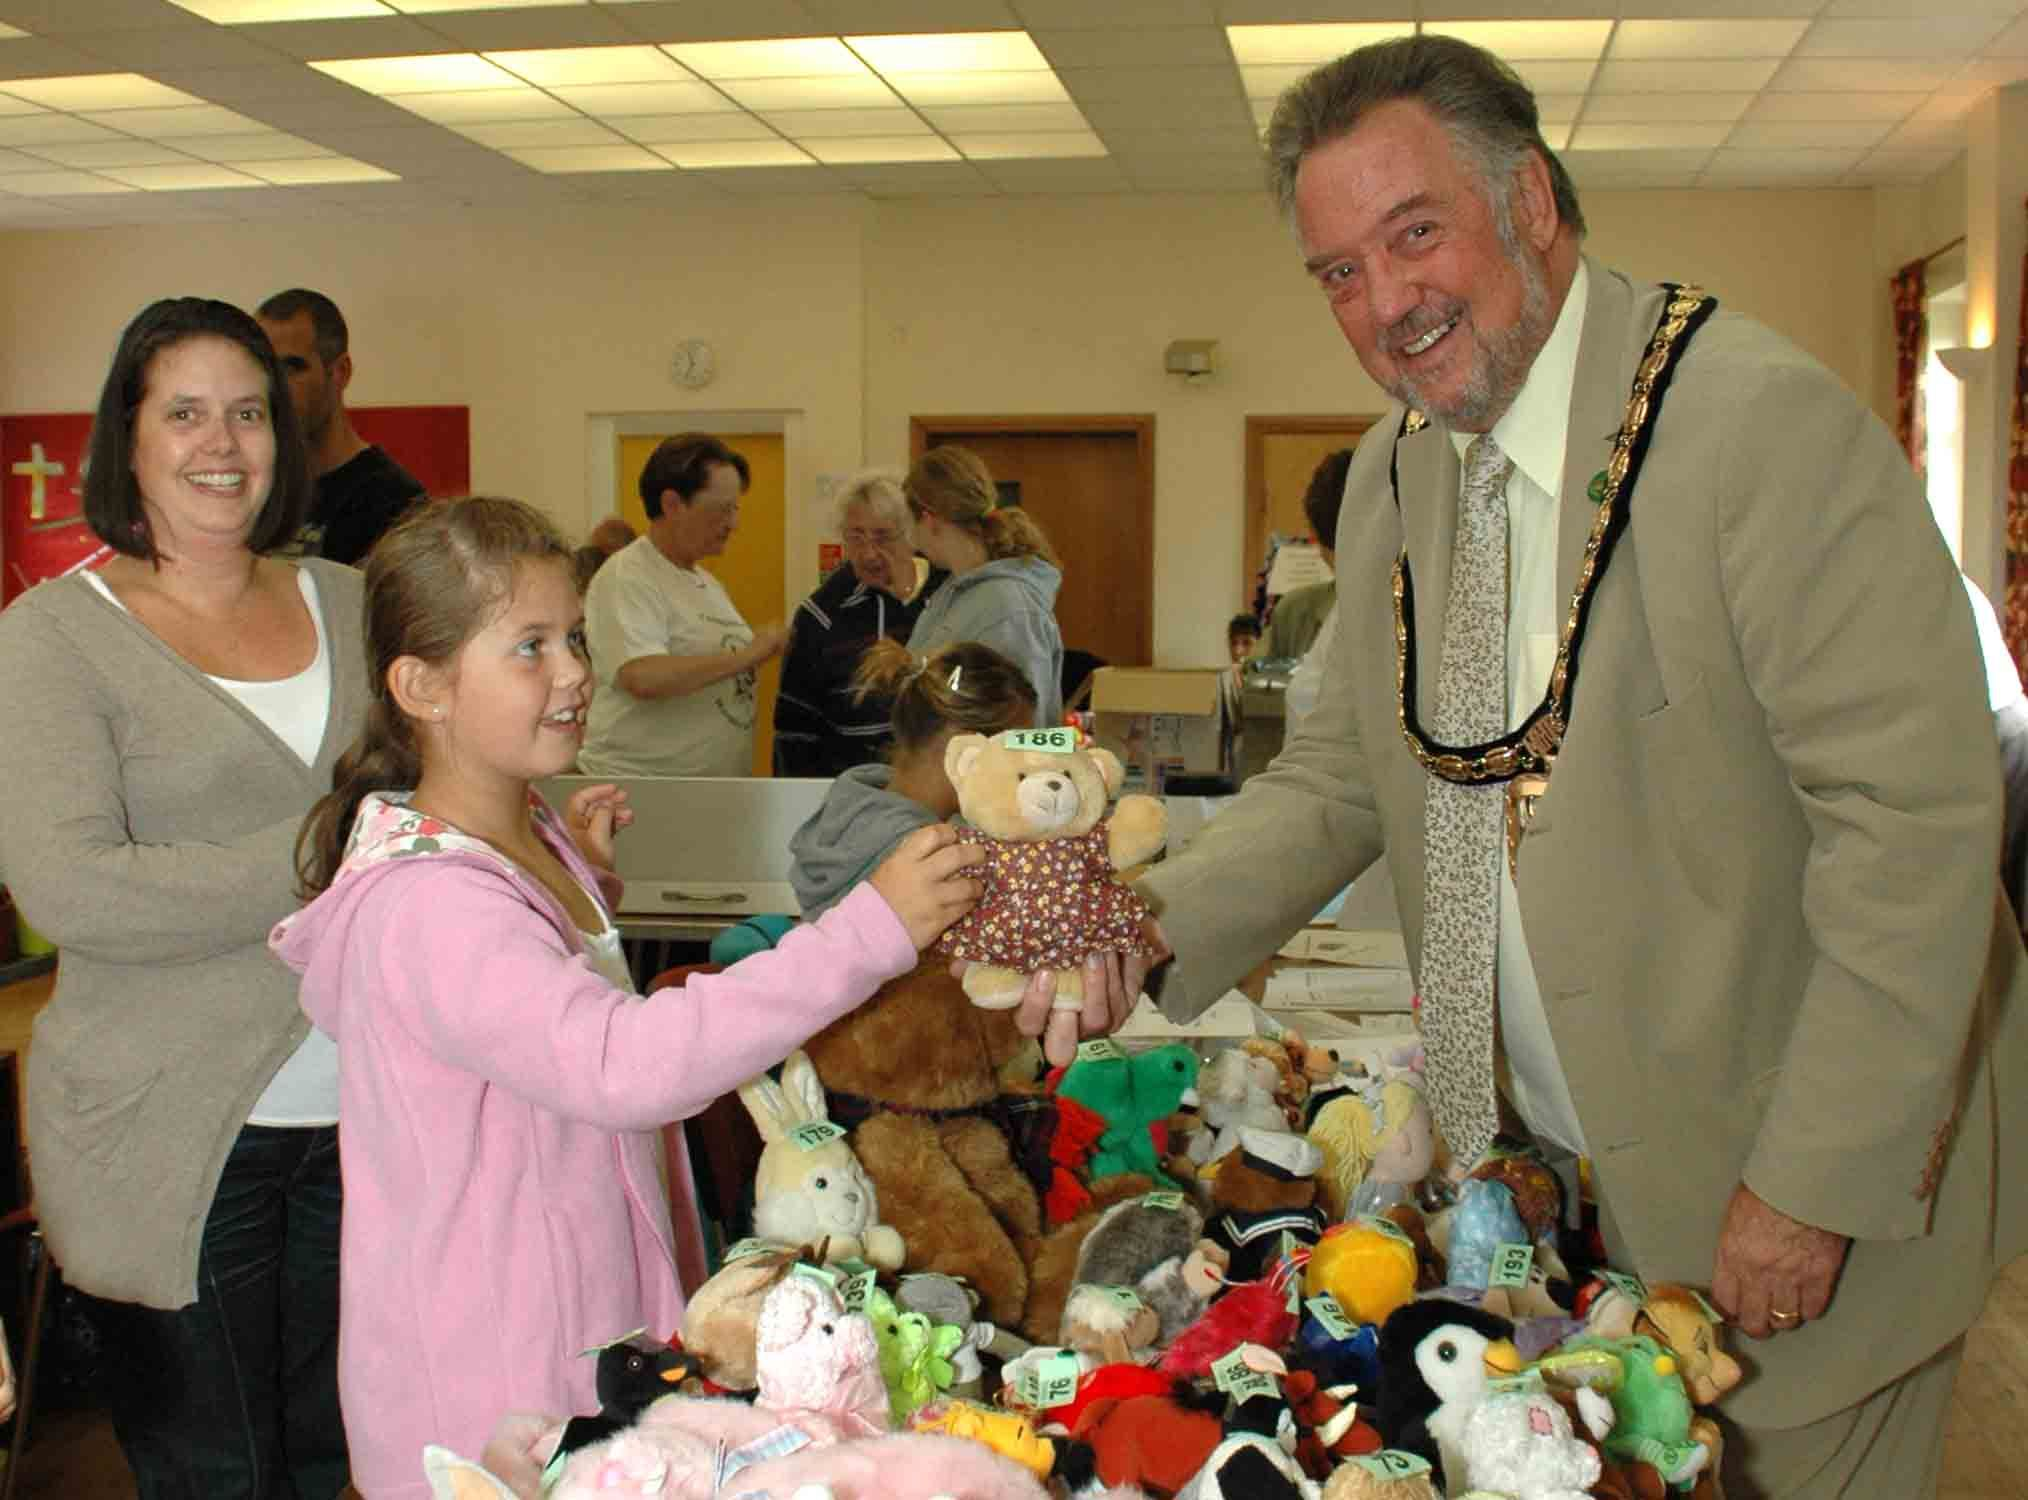 The Mayor of Havant, Councillor Ken Smith rehomes a Teddy Bear at the Rosemary Foundation Roadshow